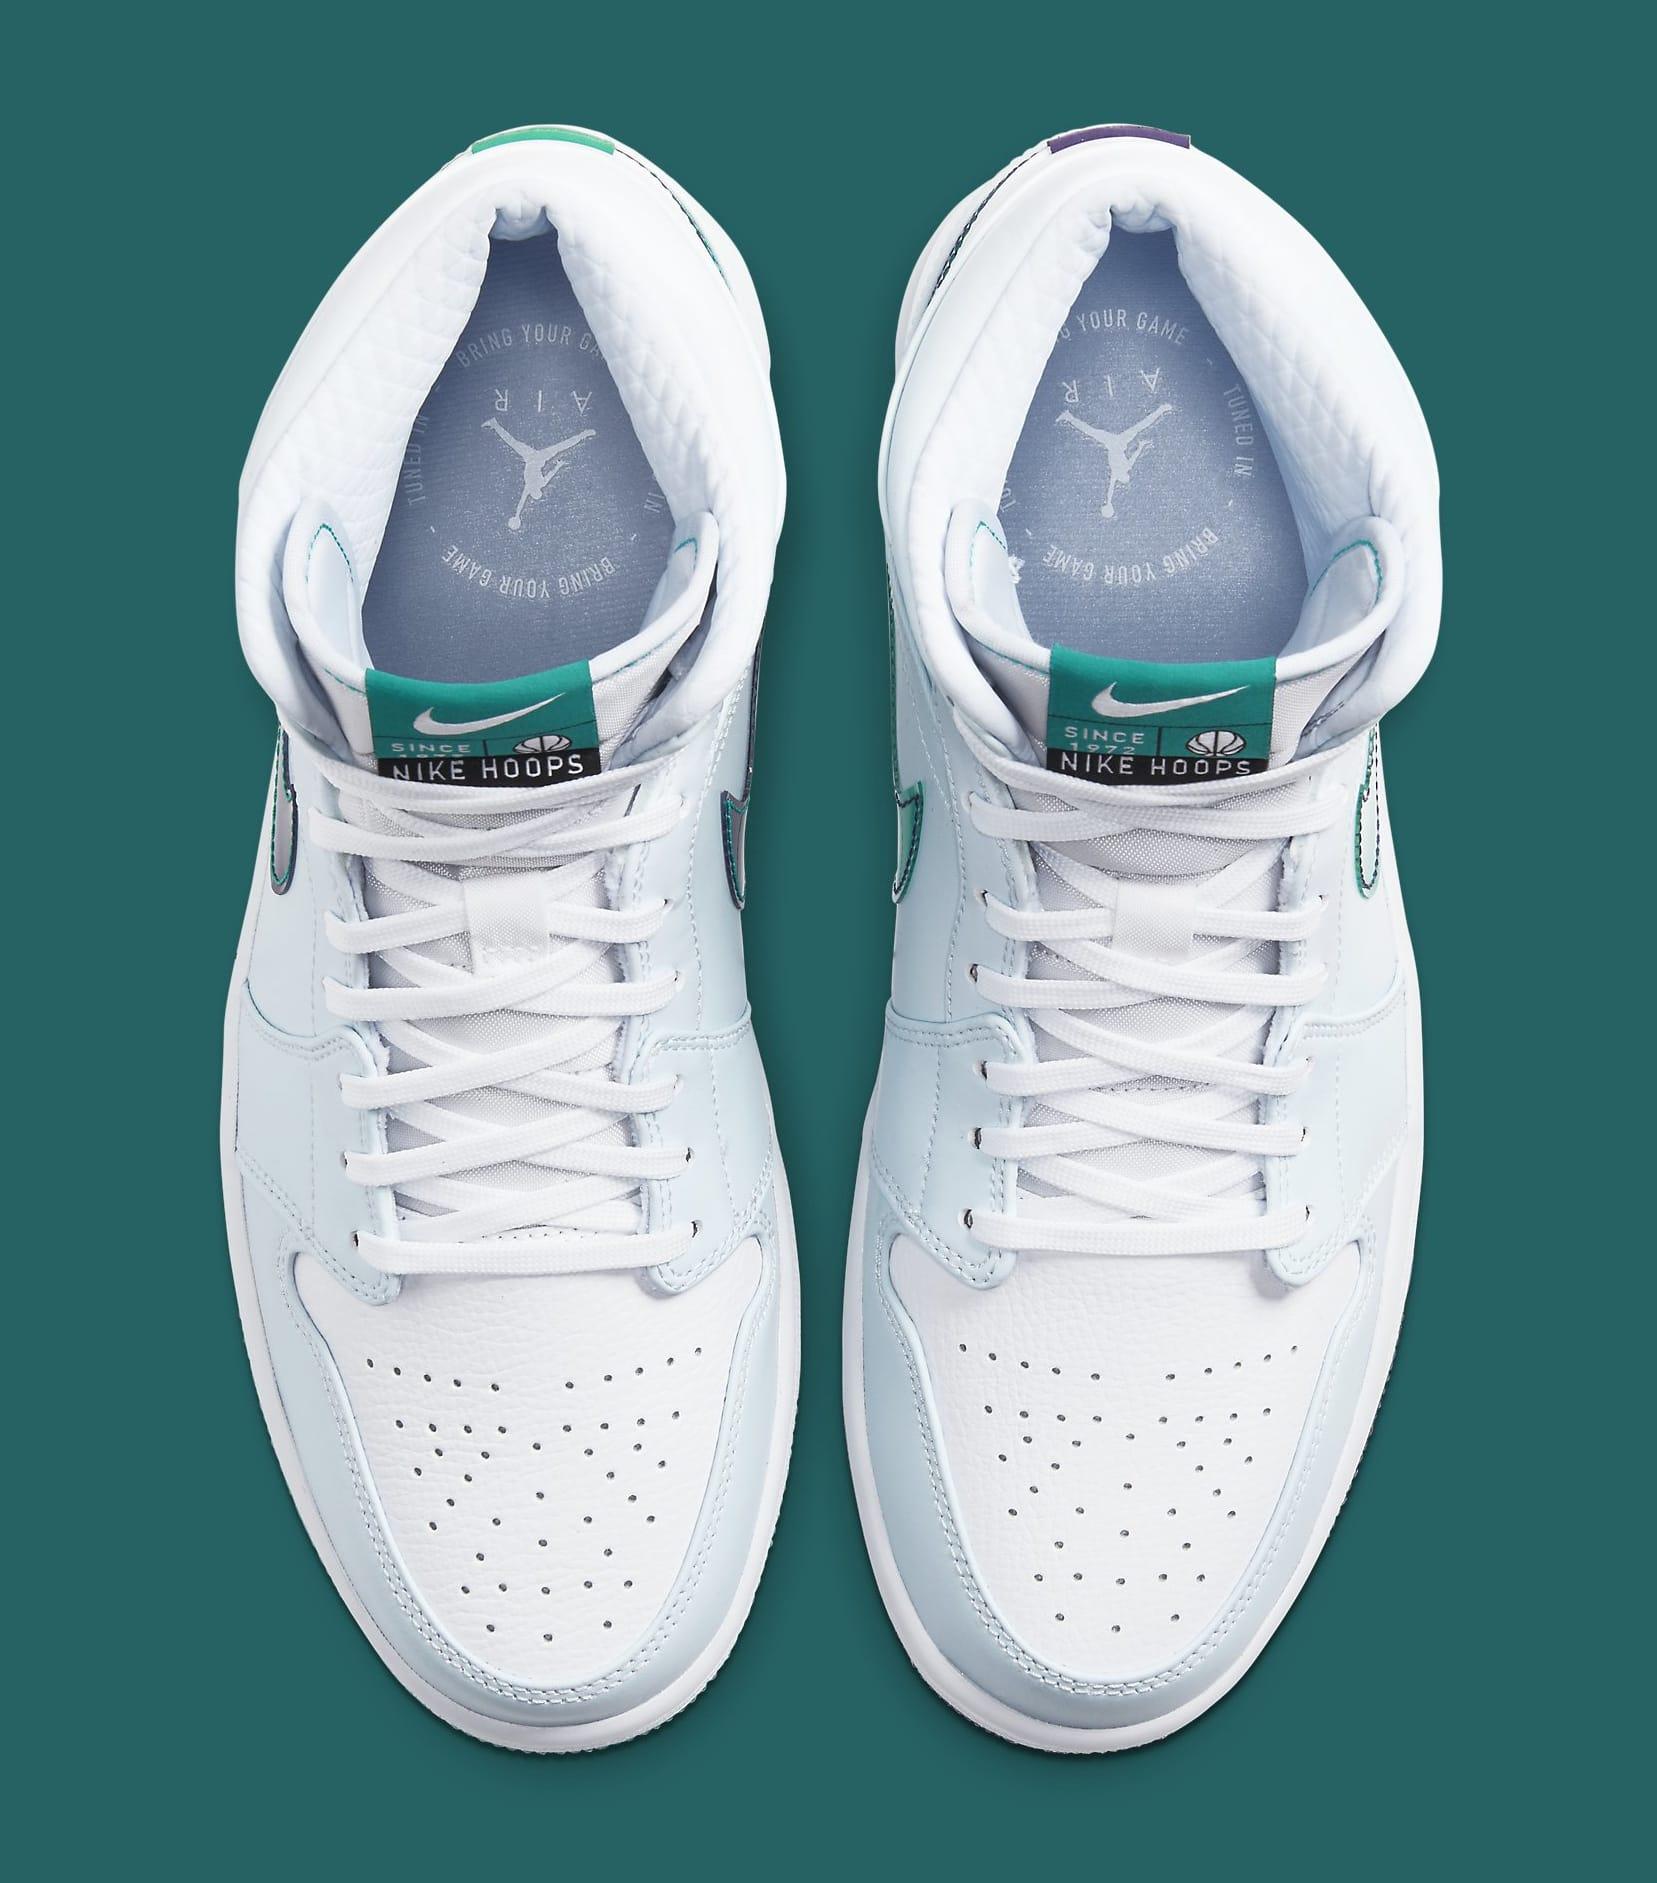 Air Jordan 1 Mid Se Luka Doncic Pregame Release Date Cw5853 100 Sole Collector